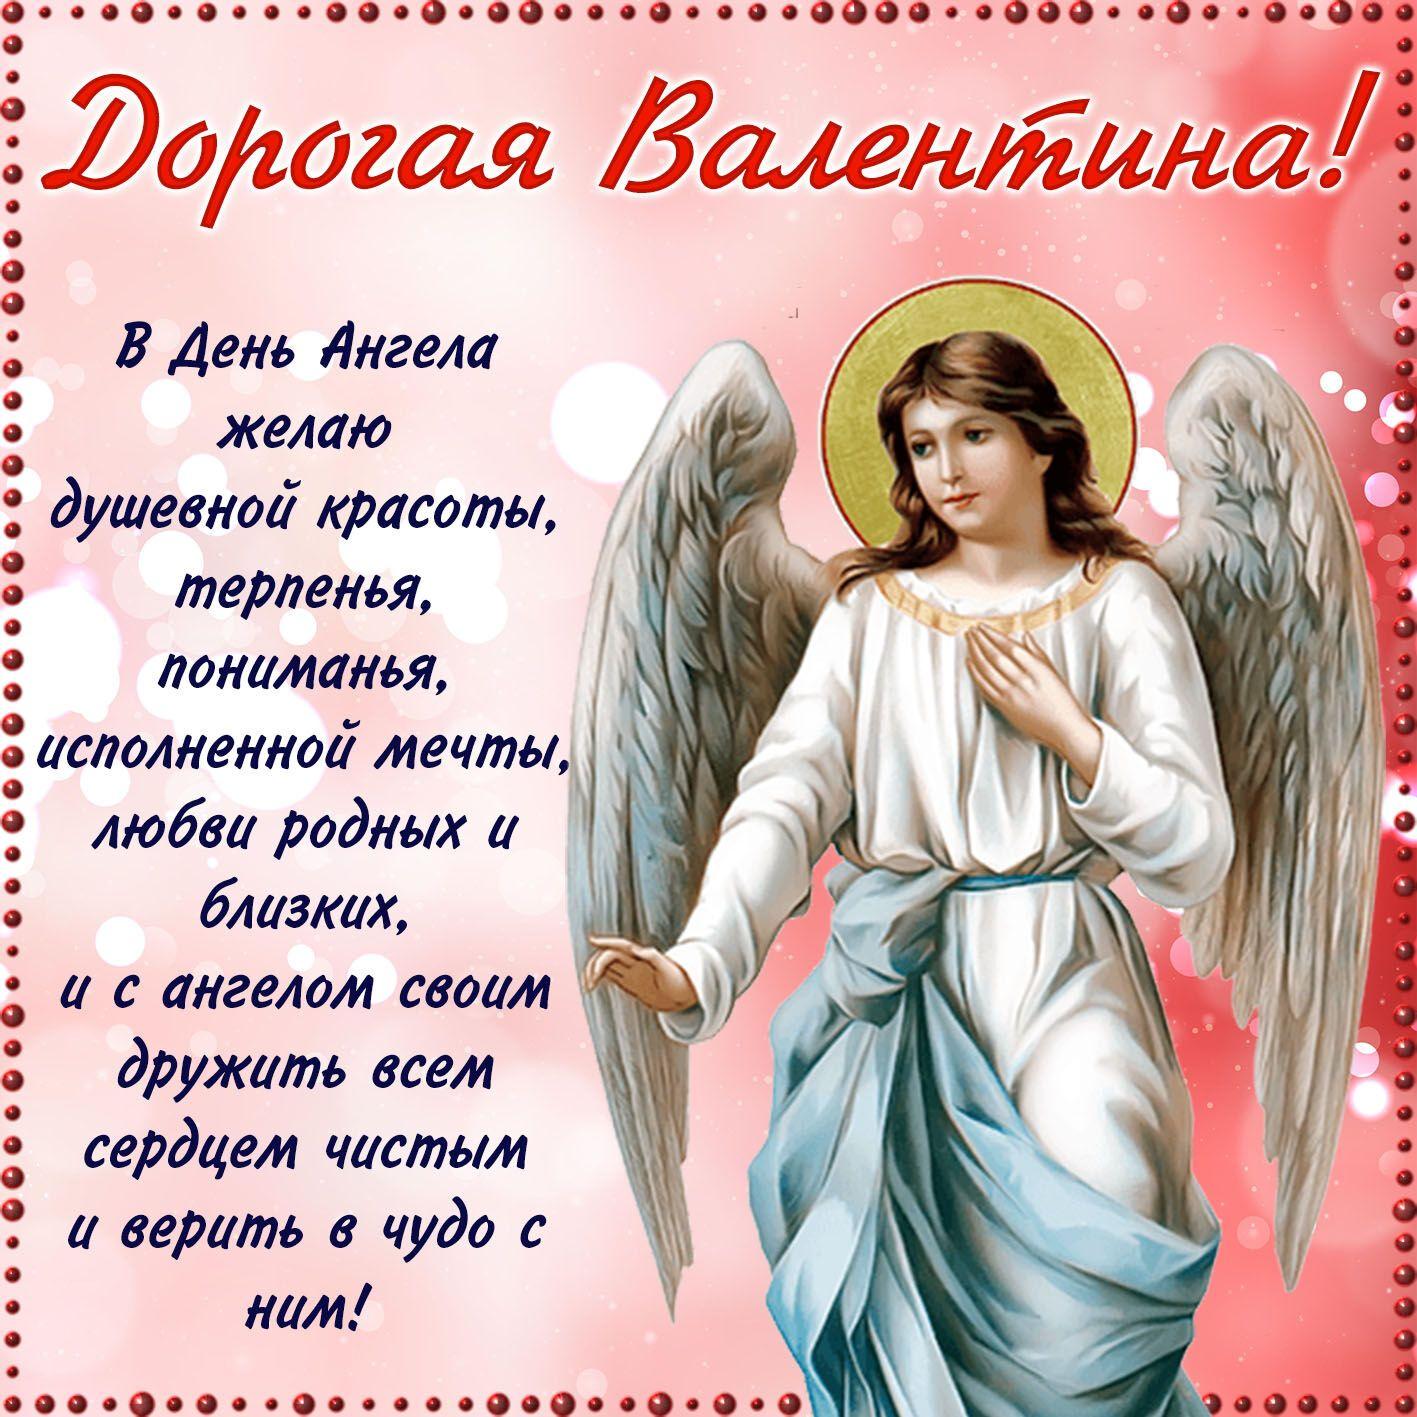 День ангела Валентины